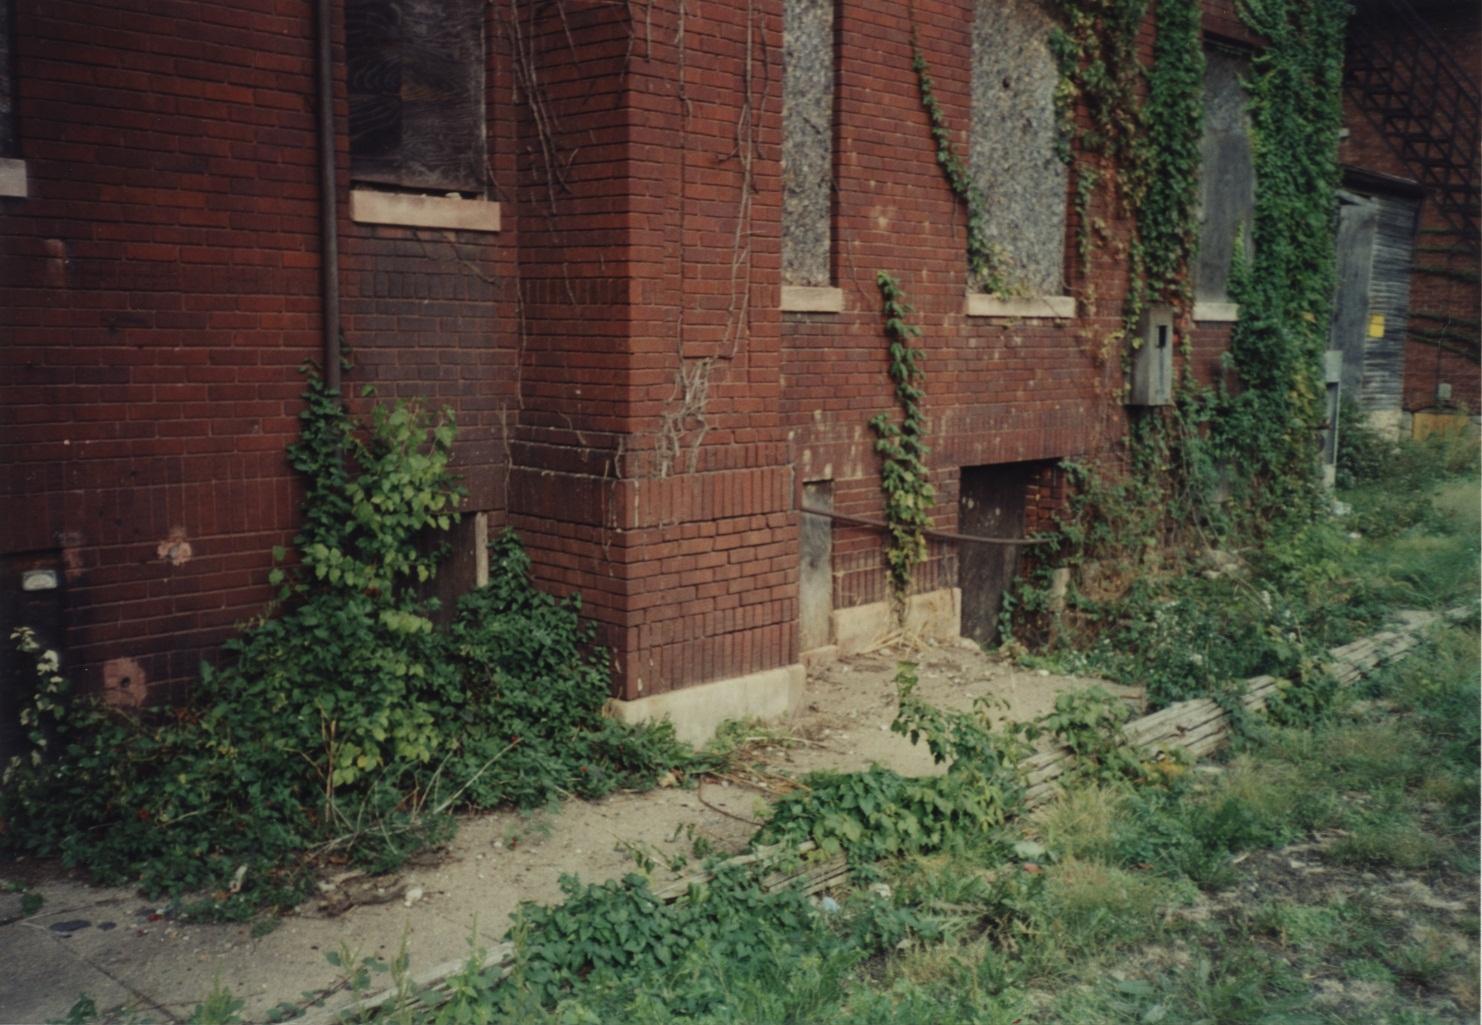 Renovation Began in 2001